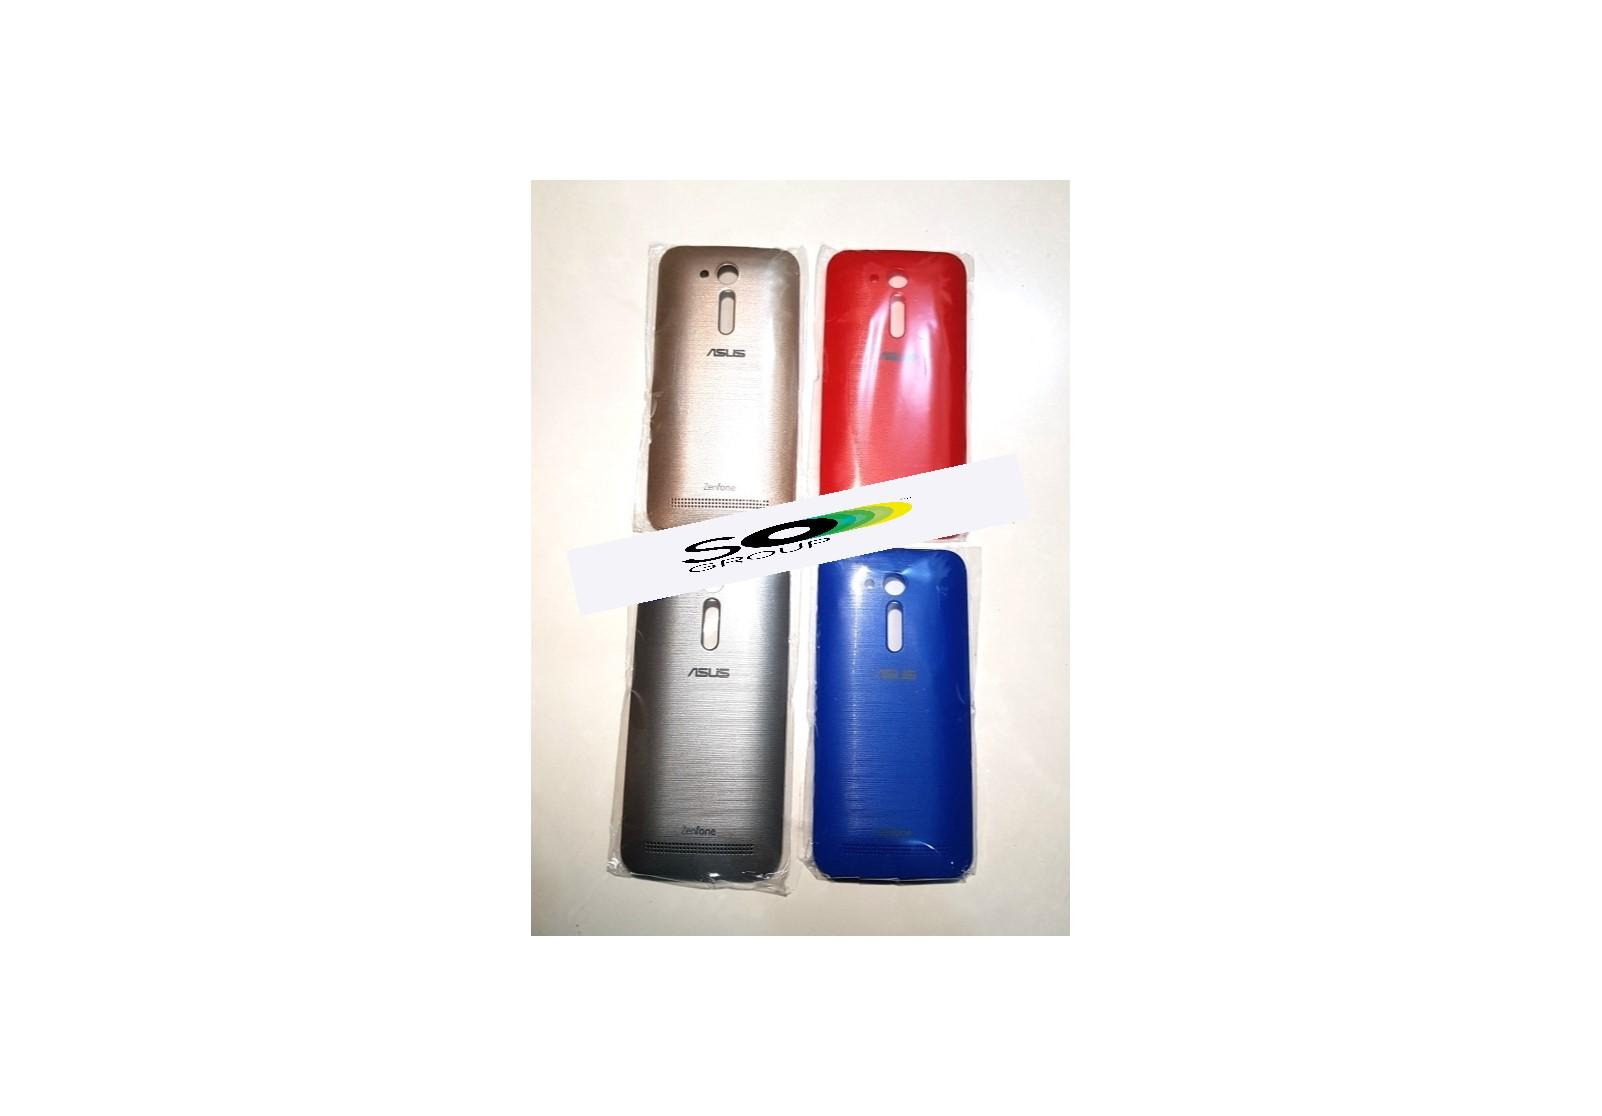 Buy Sell Cheapest Zb New Hood Best Quality Product Deals Tpu Slim Case Matte Black Babyskin For Asus Zb602kl Zb601kl Zenfone Max Pro M1 2018 Hot Backdoor Backcover Tutup Belakang Go B Zb452kg